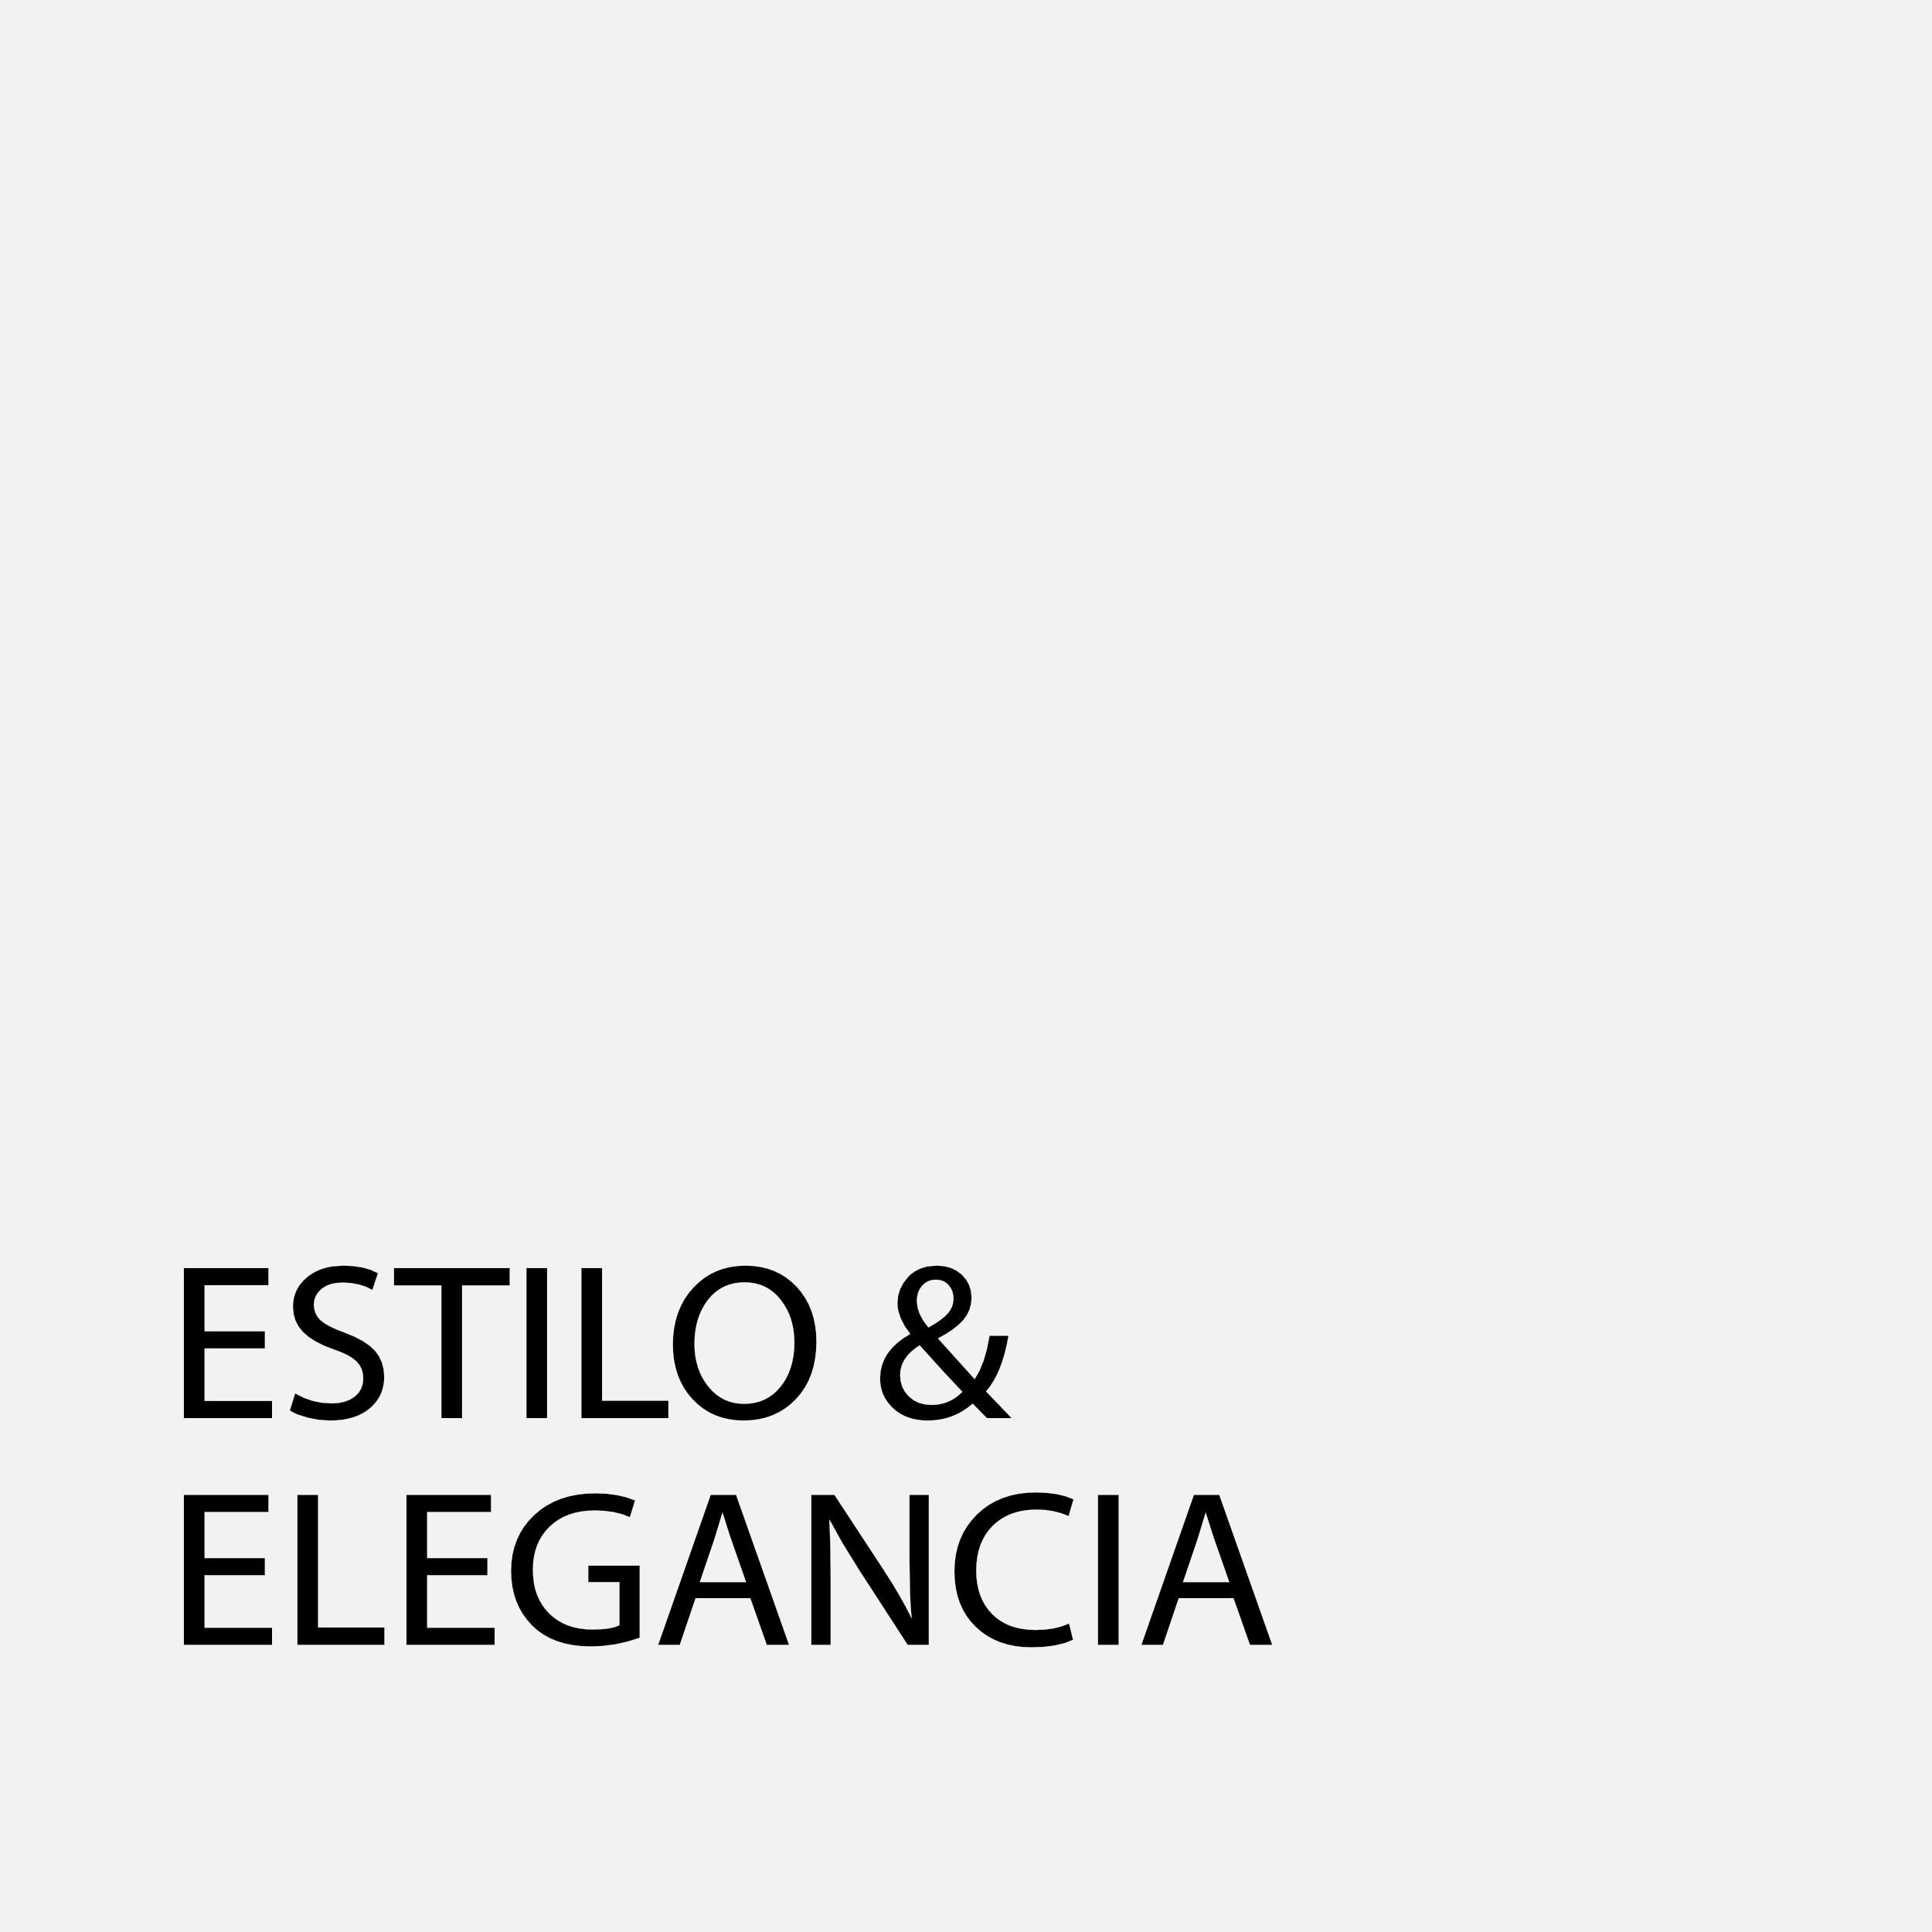 EstiloElegancia.jpg